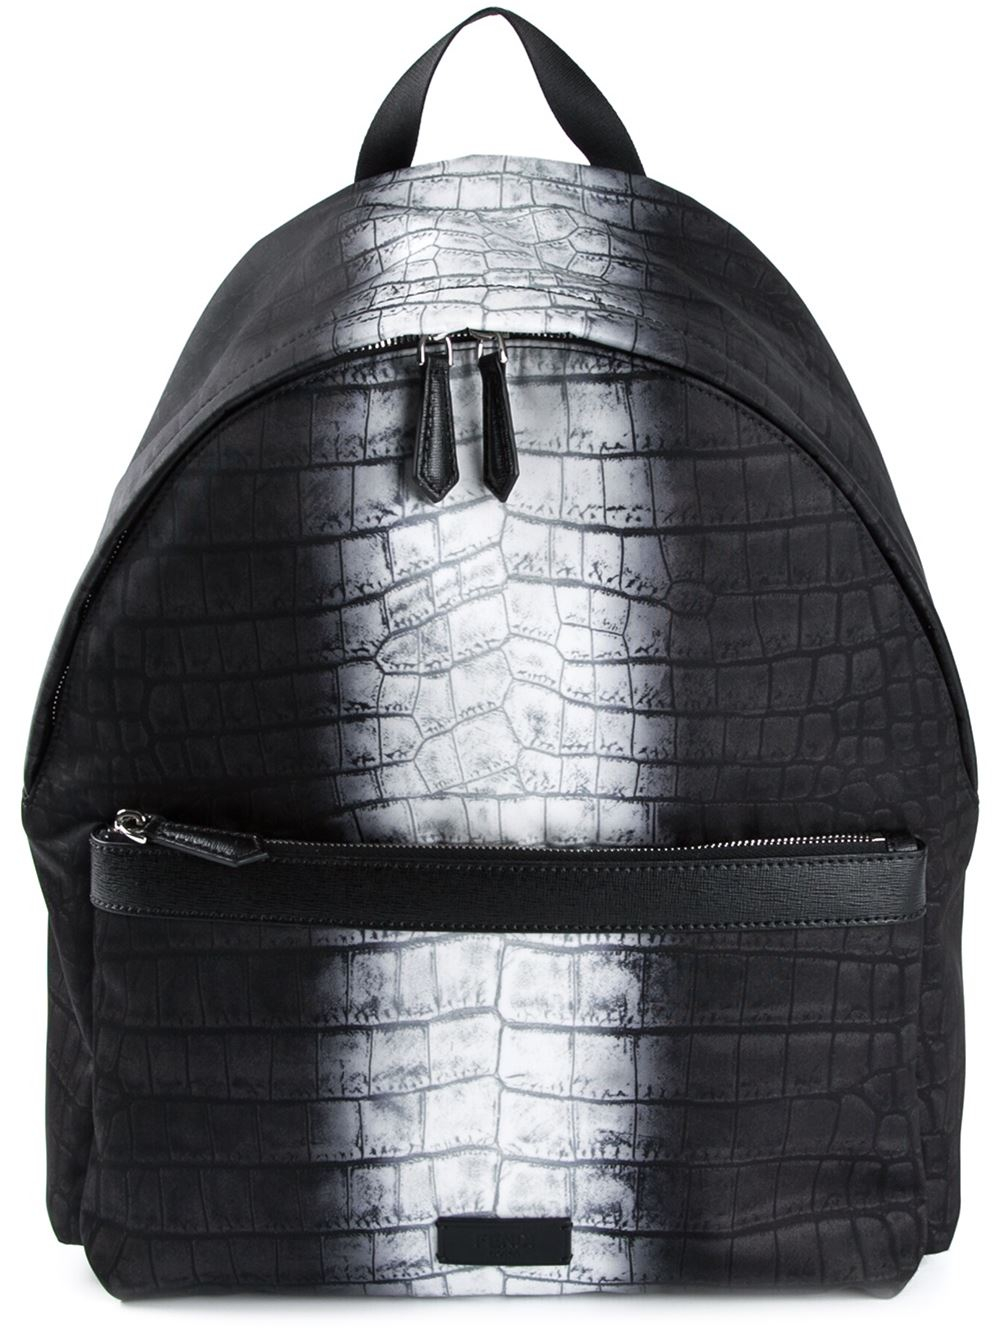 4498c7121d18 Lyst - Fendi  Code  Backpack in Black for Men